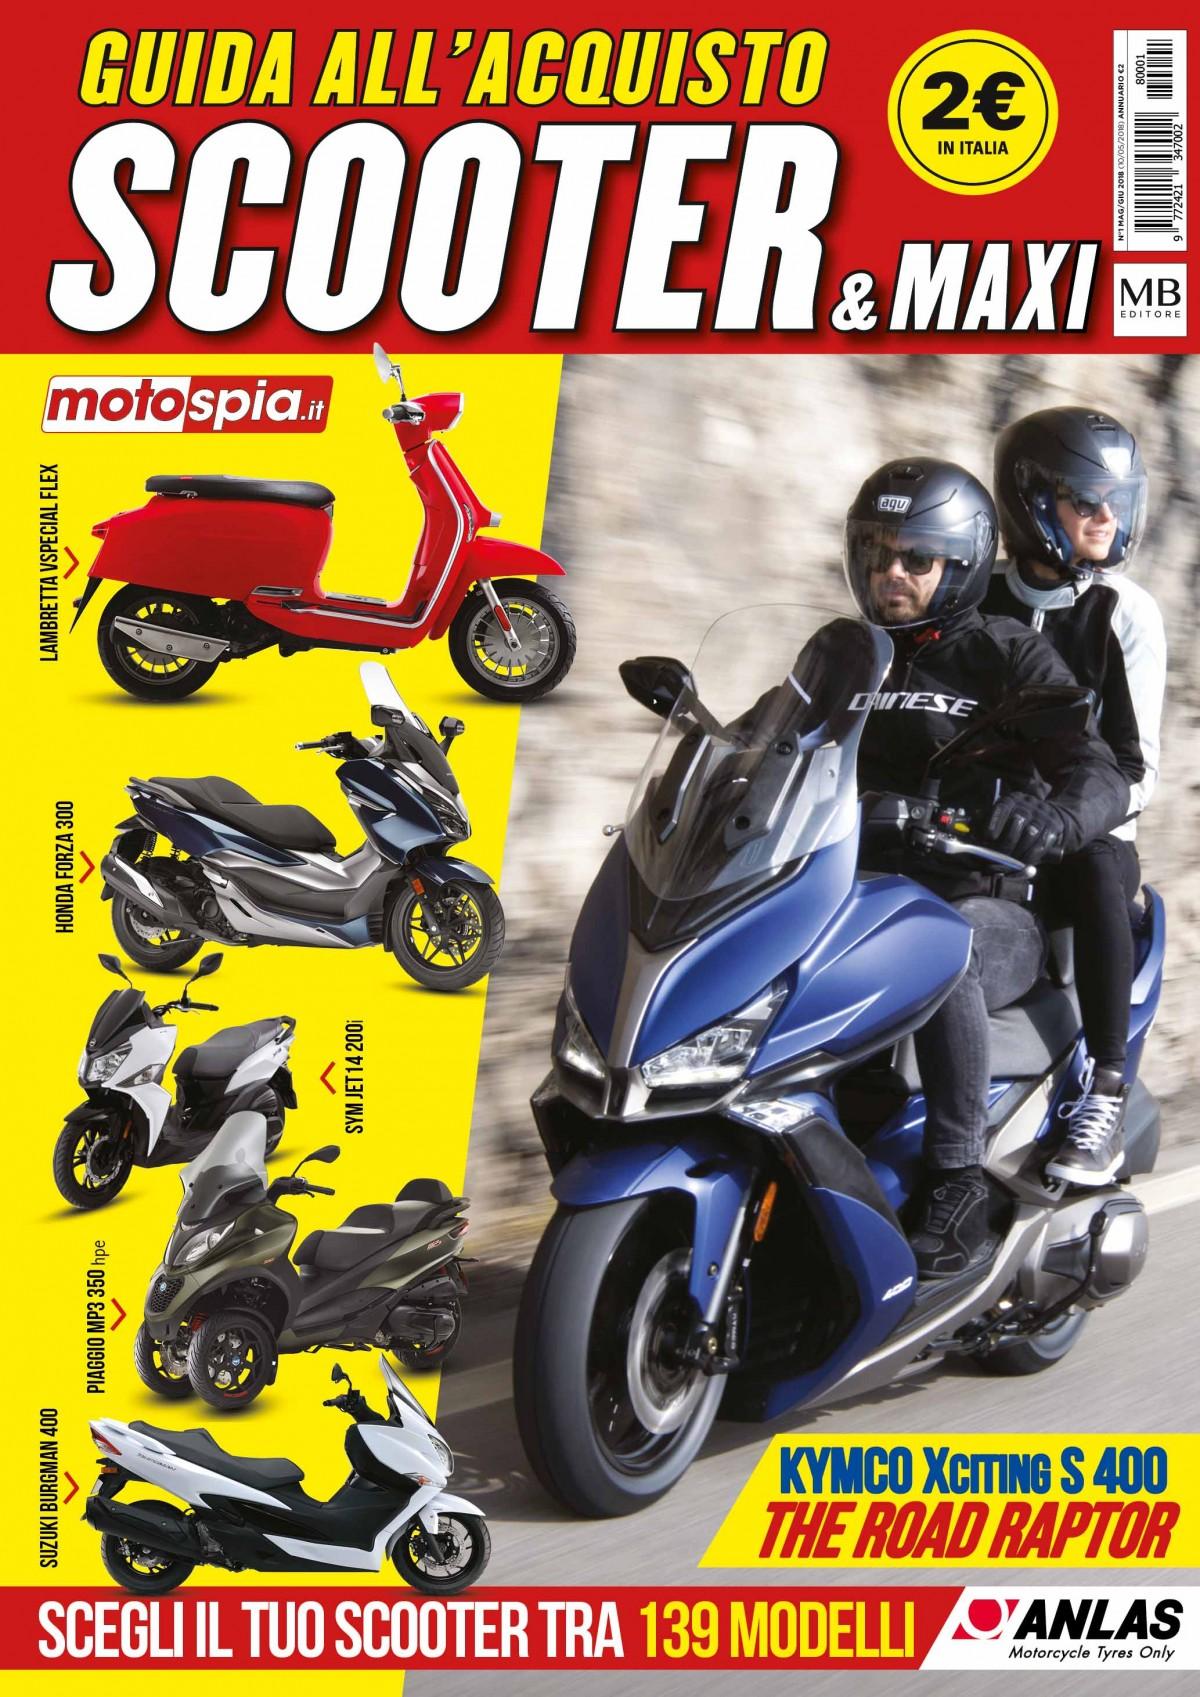 Cop scooter definitiva